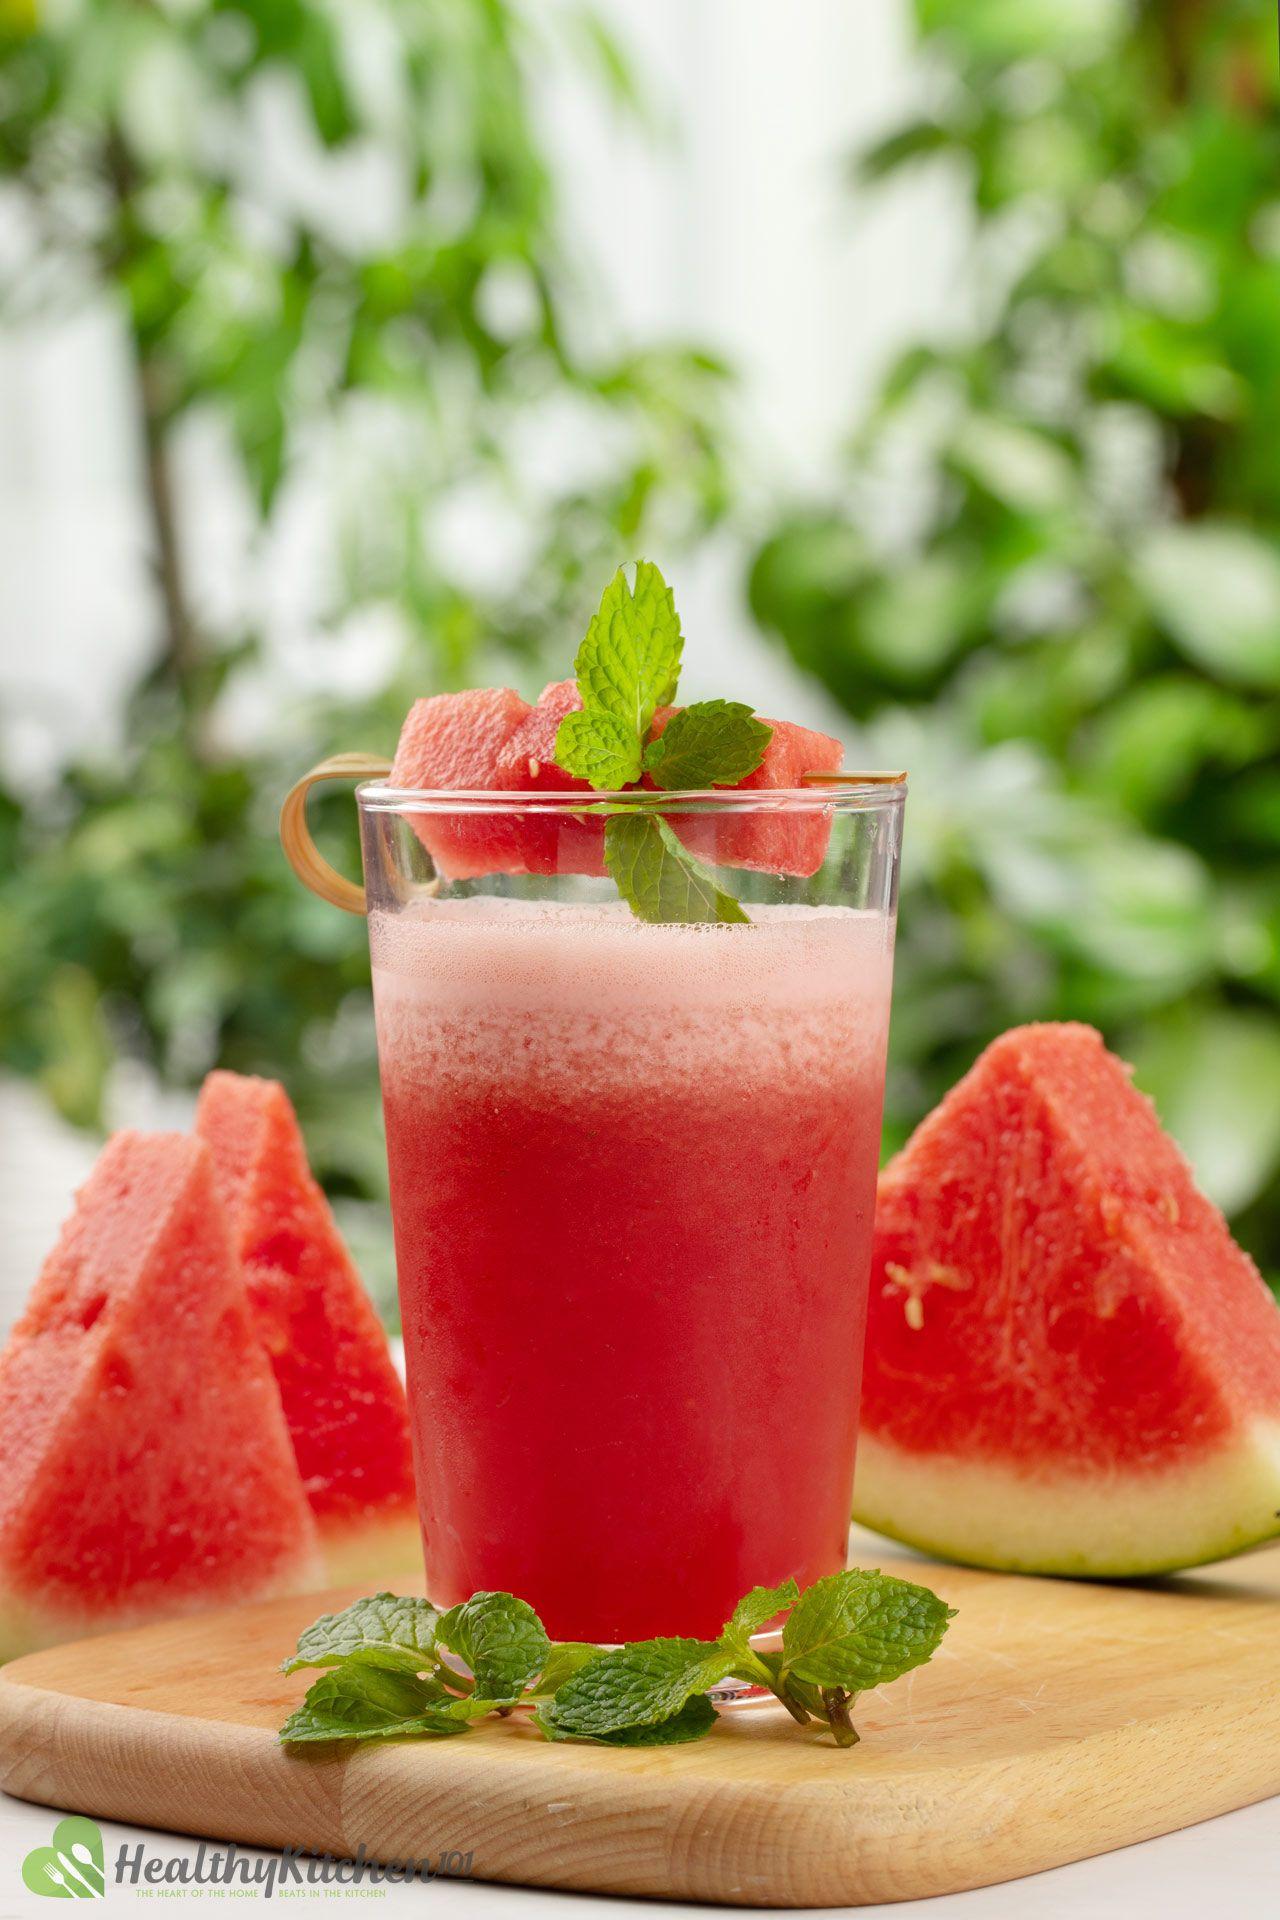 Is Watermelon Healthy